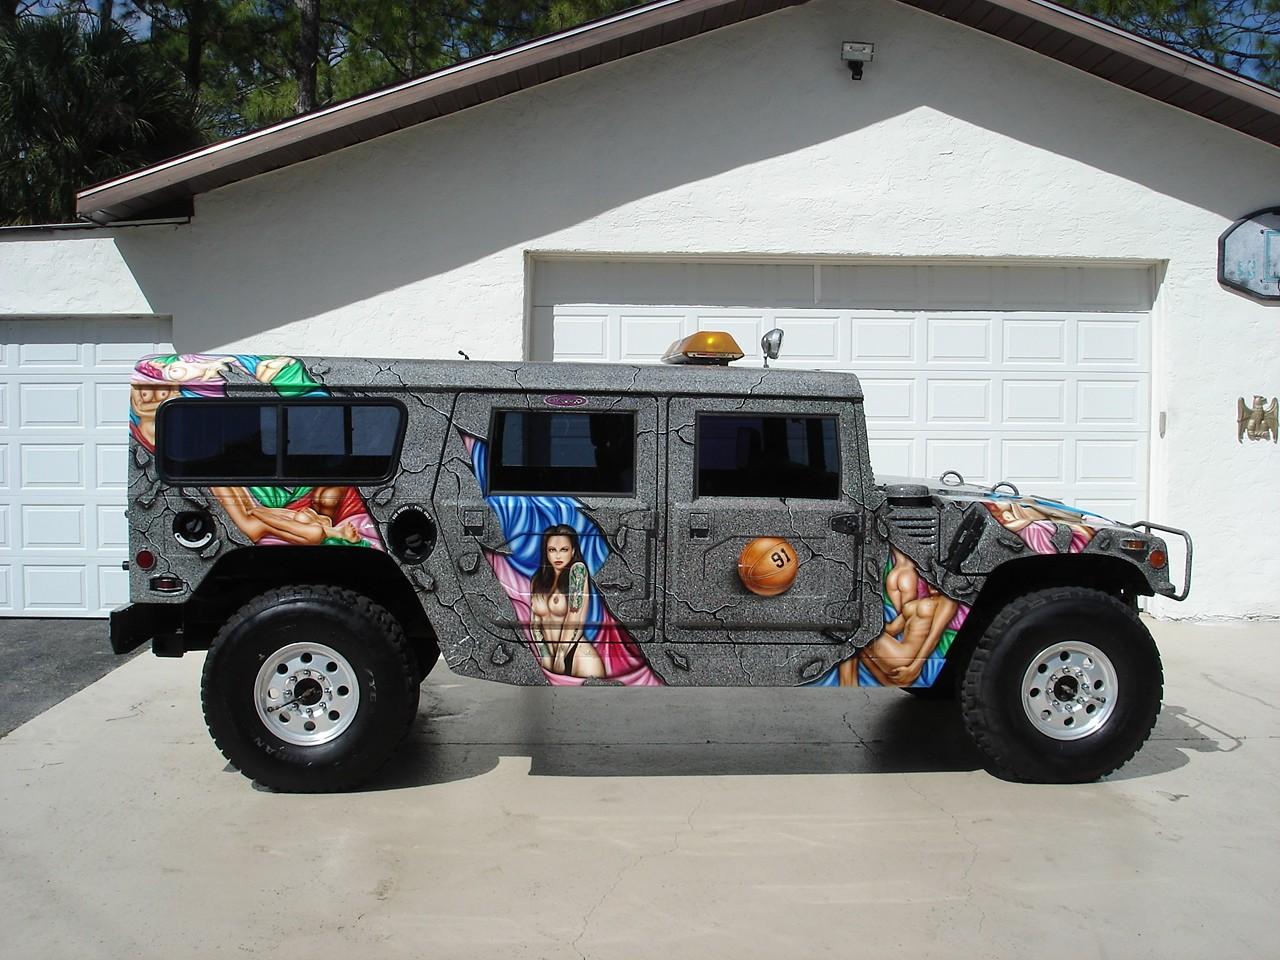 Cars For Sale Sacramento >> Dennis Rodman's Hummer H1 Is Up For Sale, But Will Kim Jong-un Buy it? - autoevolution